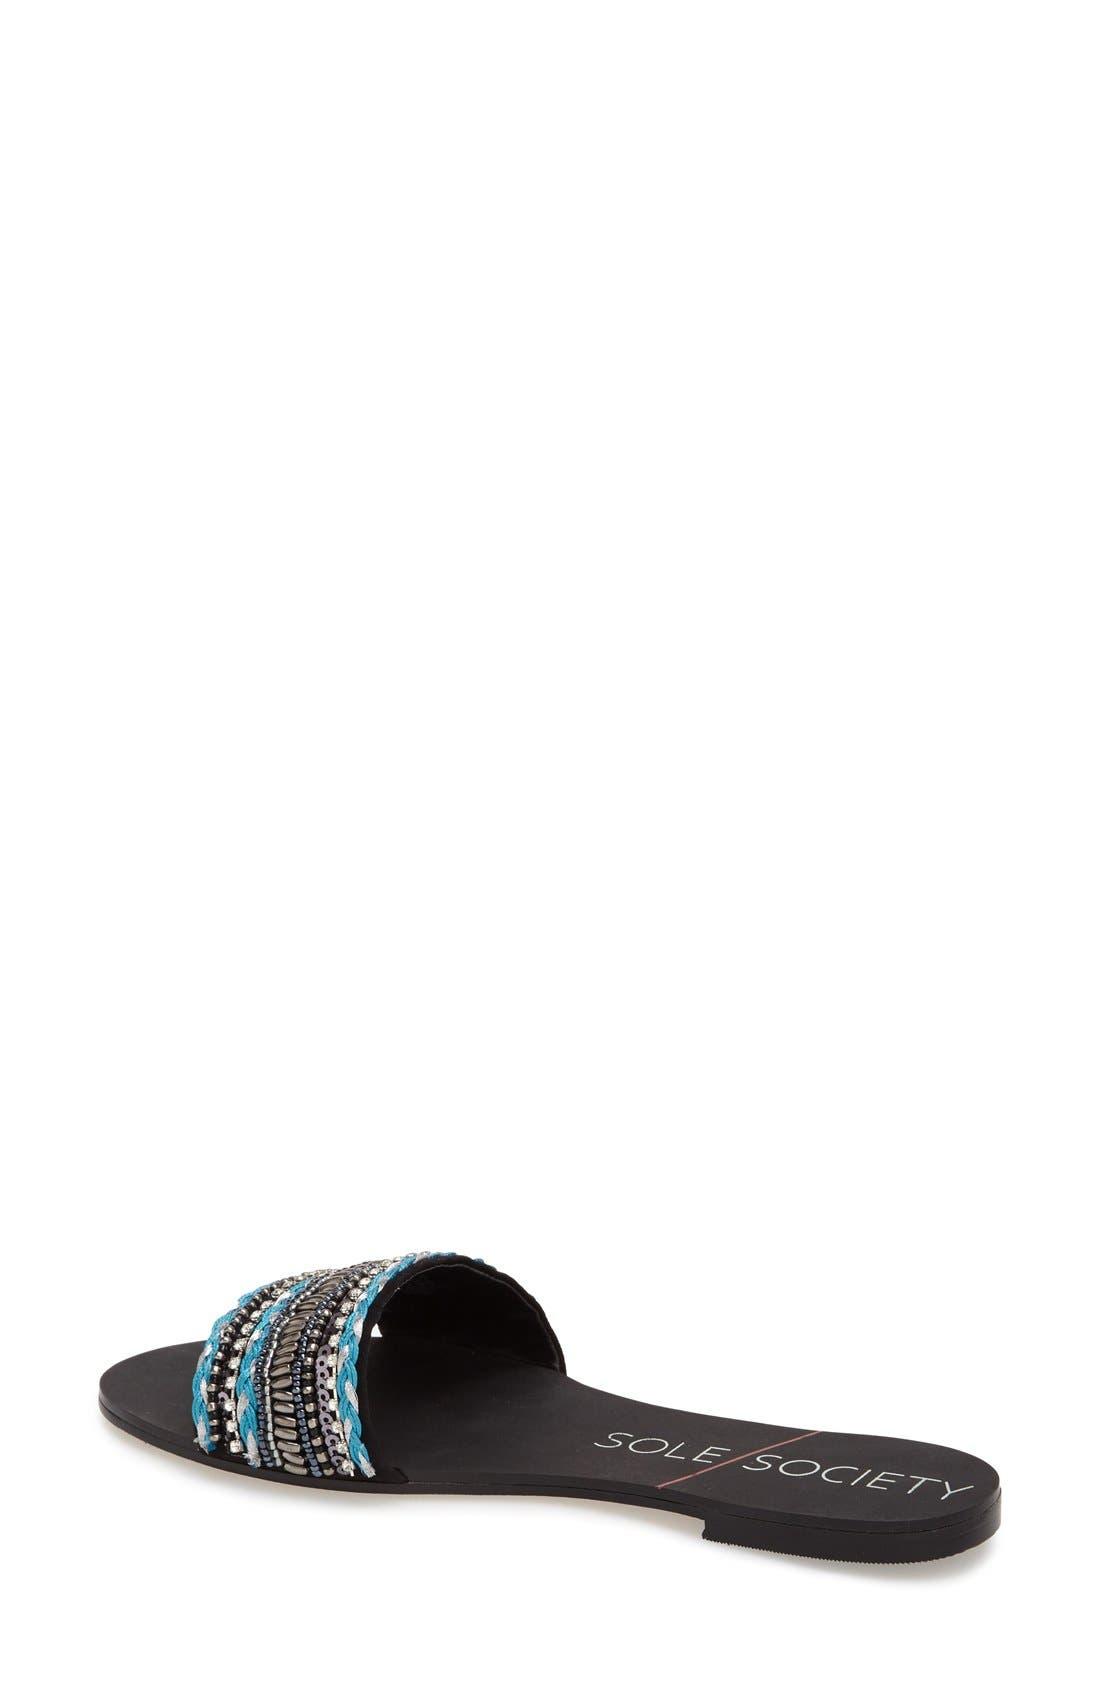 SOLE SOCIETY, 'Eliana' Slide Sandal, Alternate thumbnail 3, color, 001